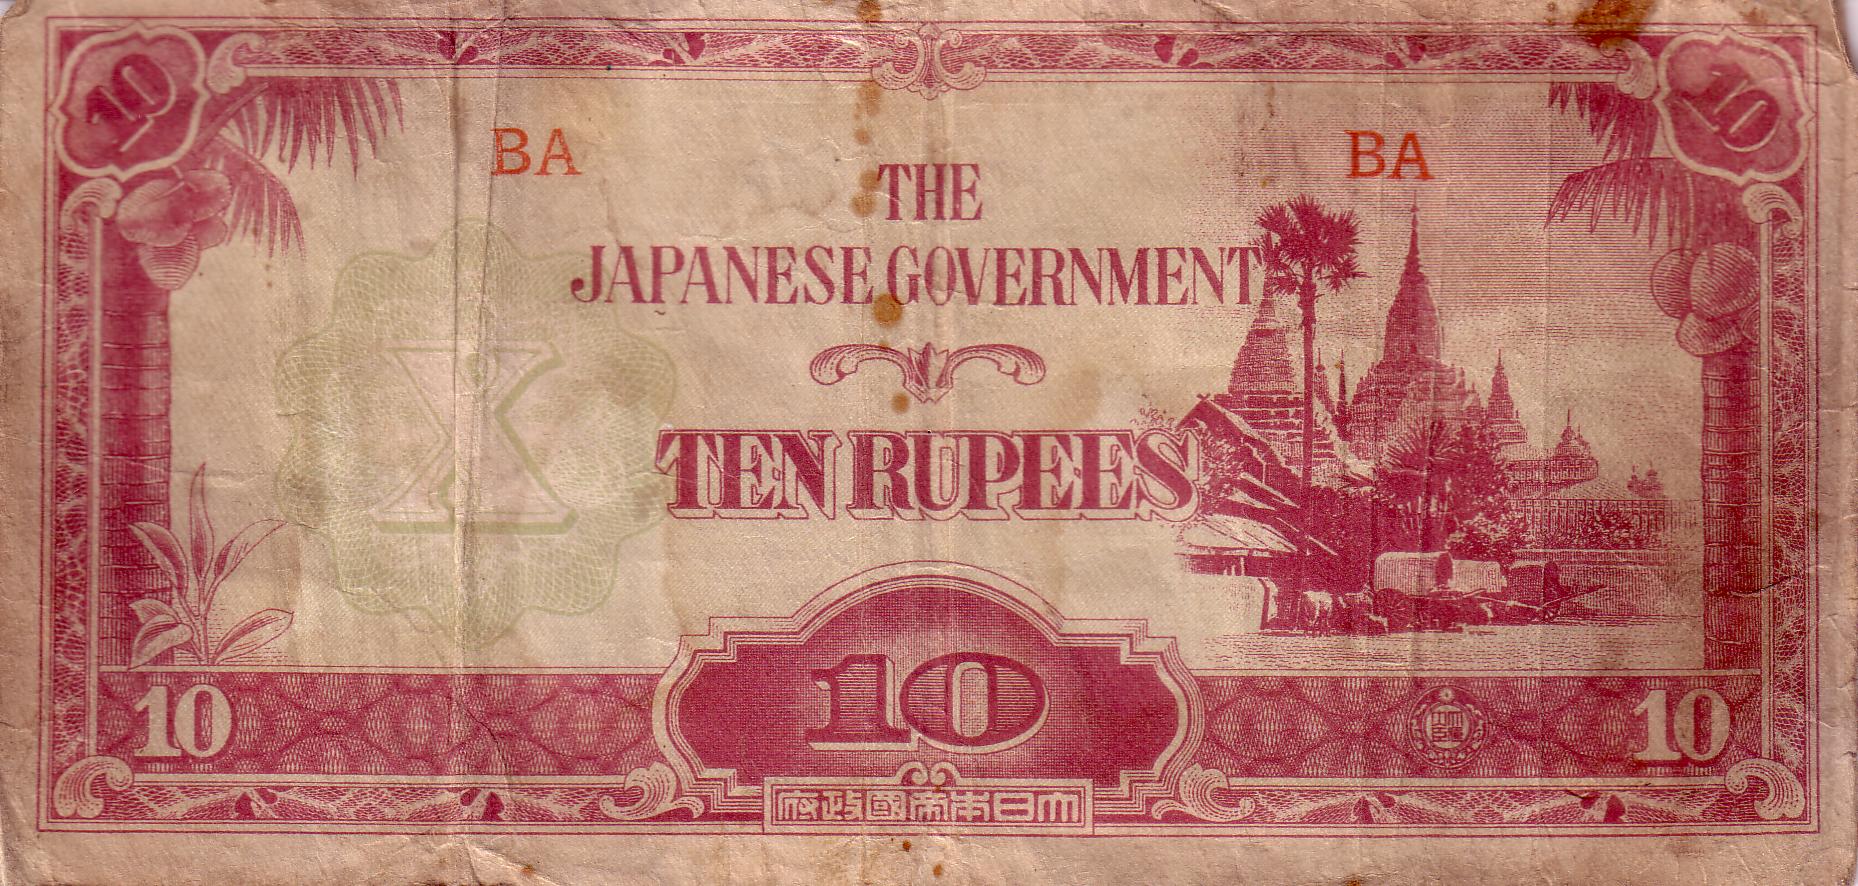 Rupee Note Png File:burmese Ten Rupees.png